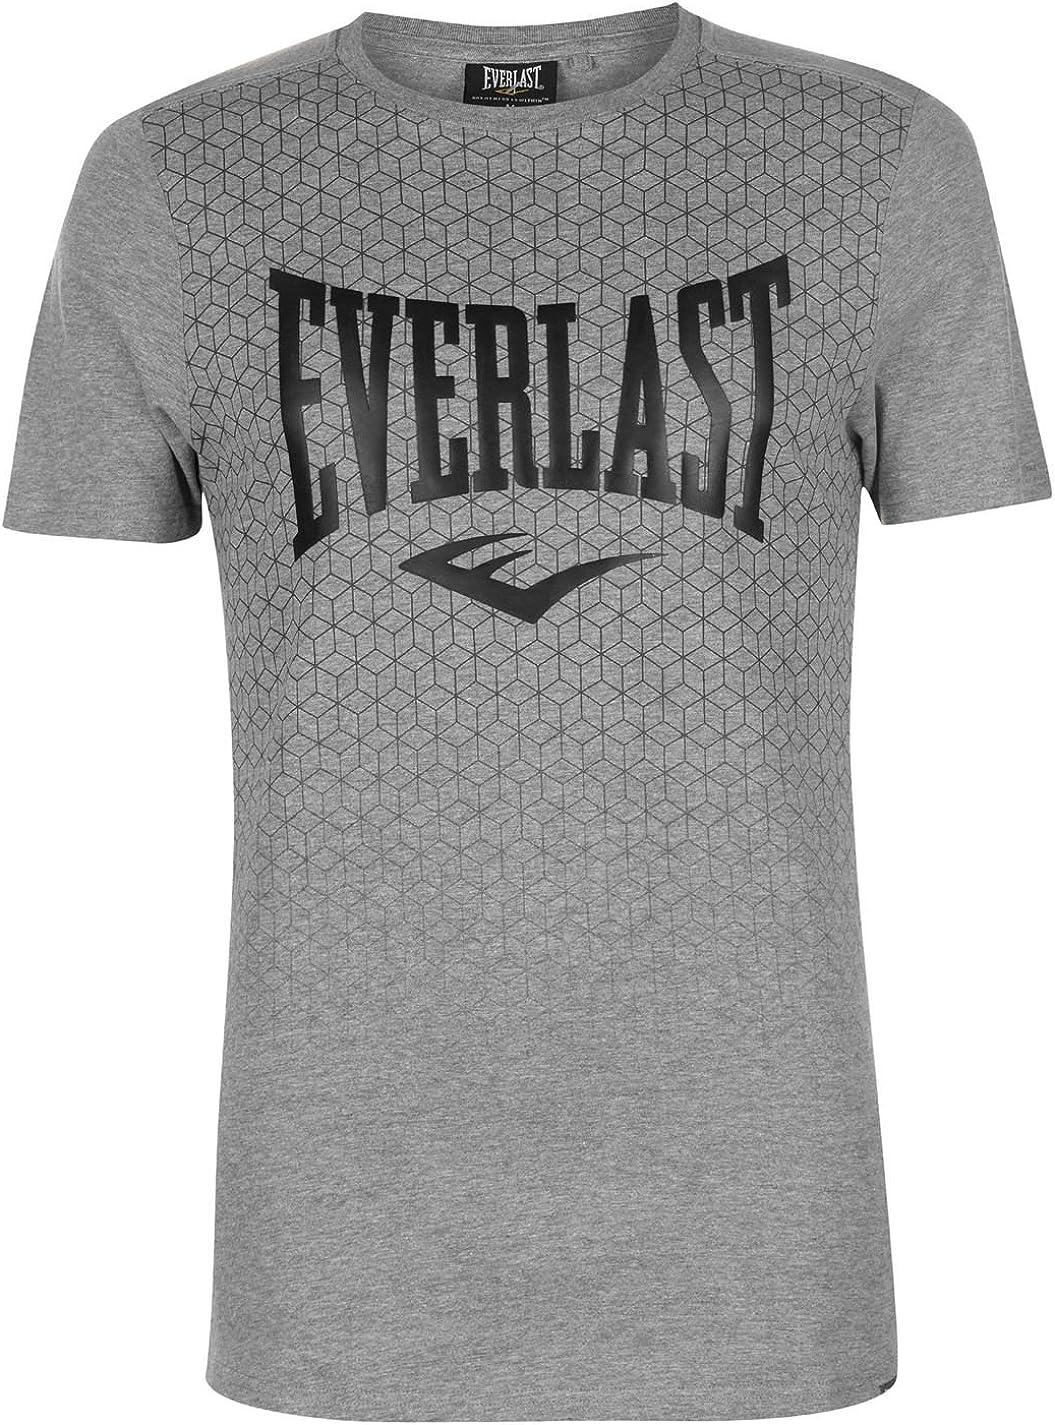 Everlast hombre impresión geométrica camiseta Grigio M Geo XL ...